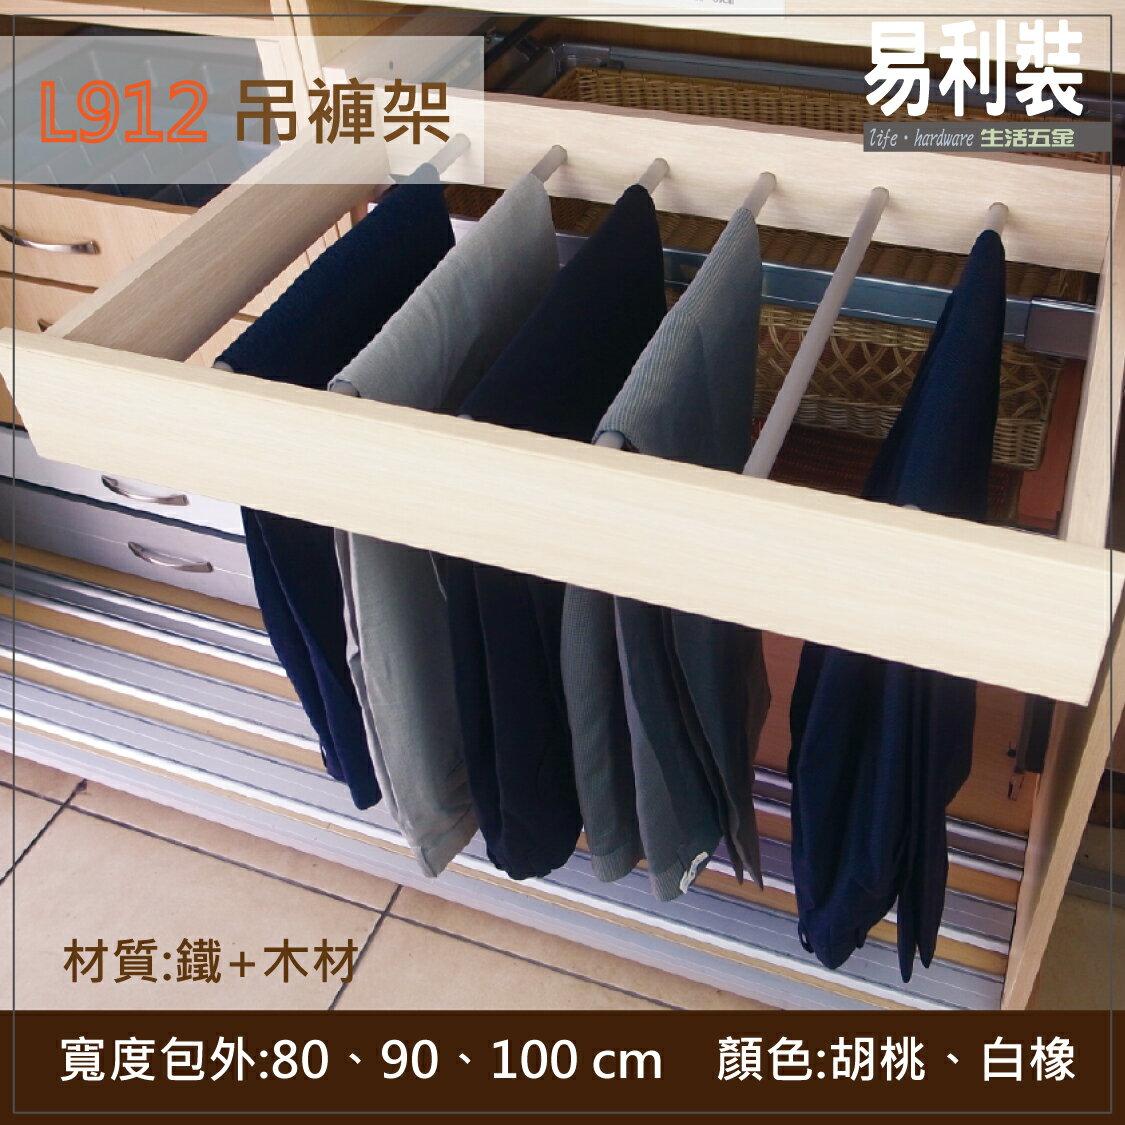 【 EASYCAN  】L912 吊褲架 易利裝生活五金 衣櫃 房間 臥房 衣櫃 小資族 辦公家具 系統家具 - 限時優惠好康折扣